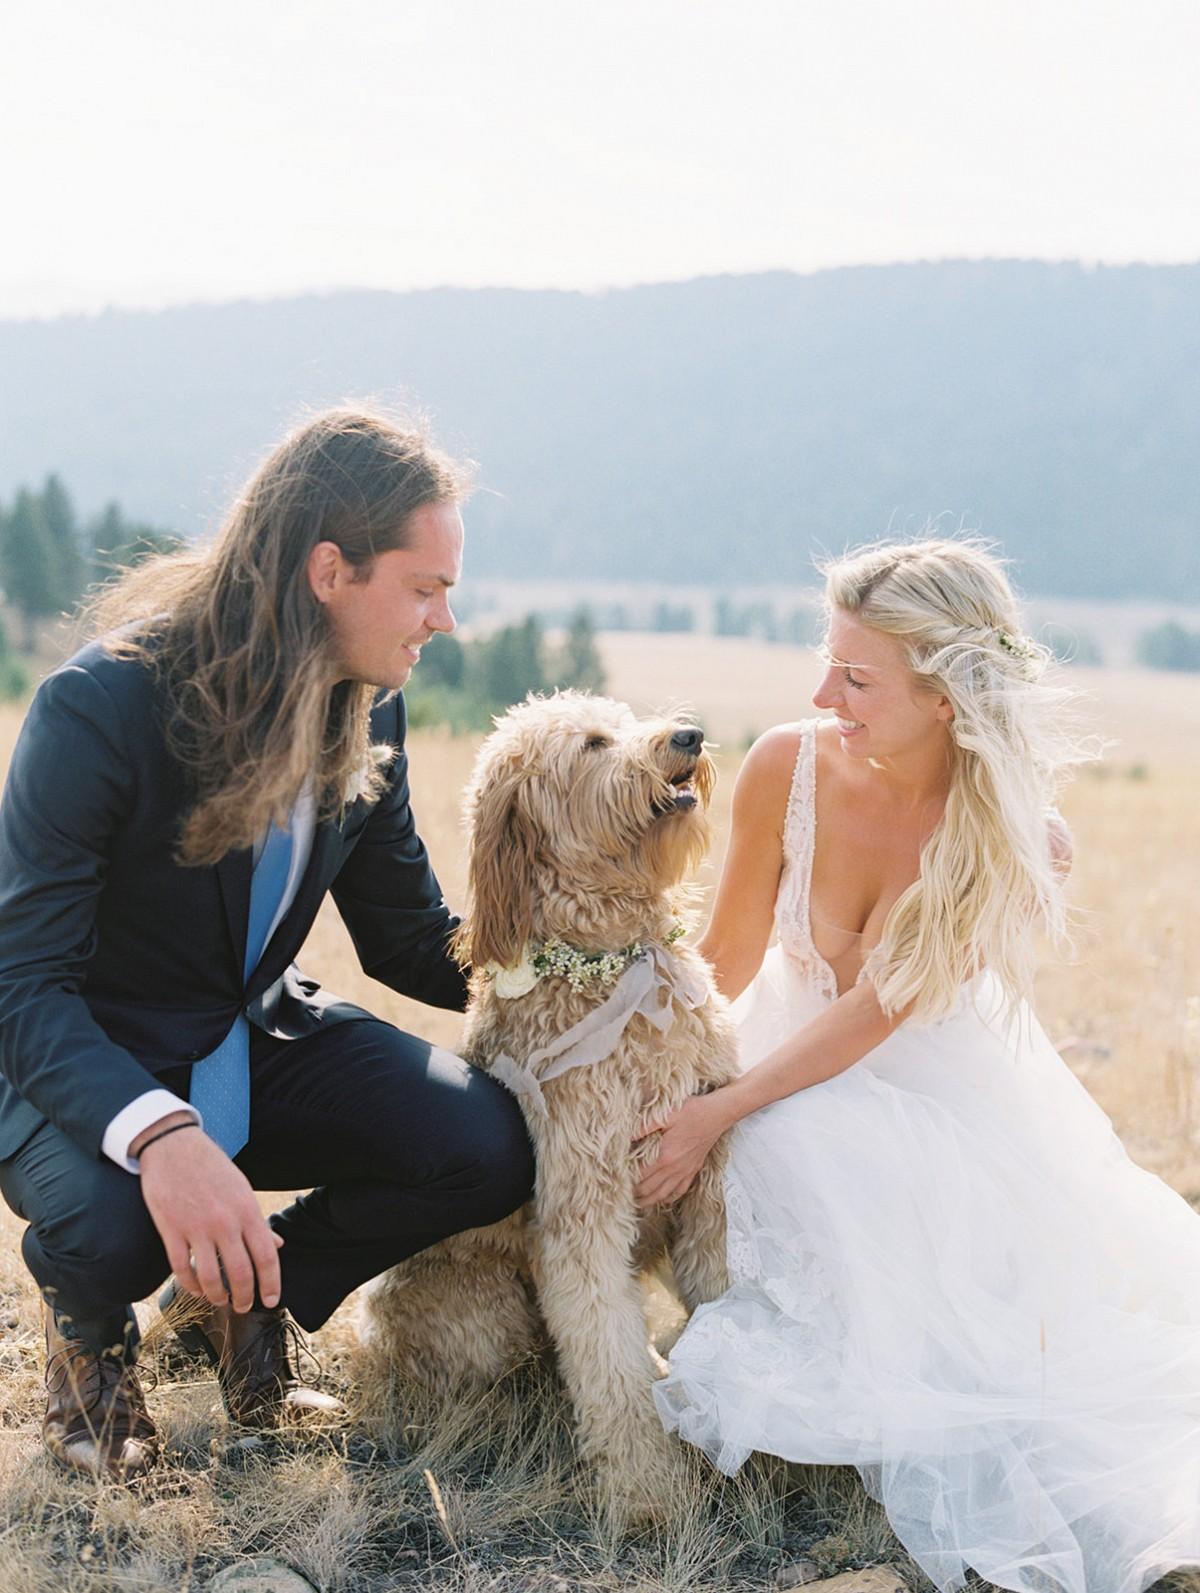 Montana Wedding With Bride & Groom Arrival on Horseback!